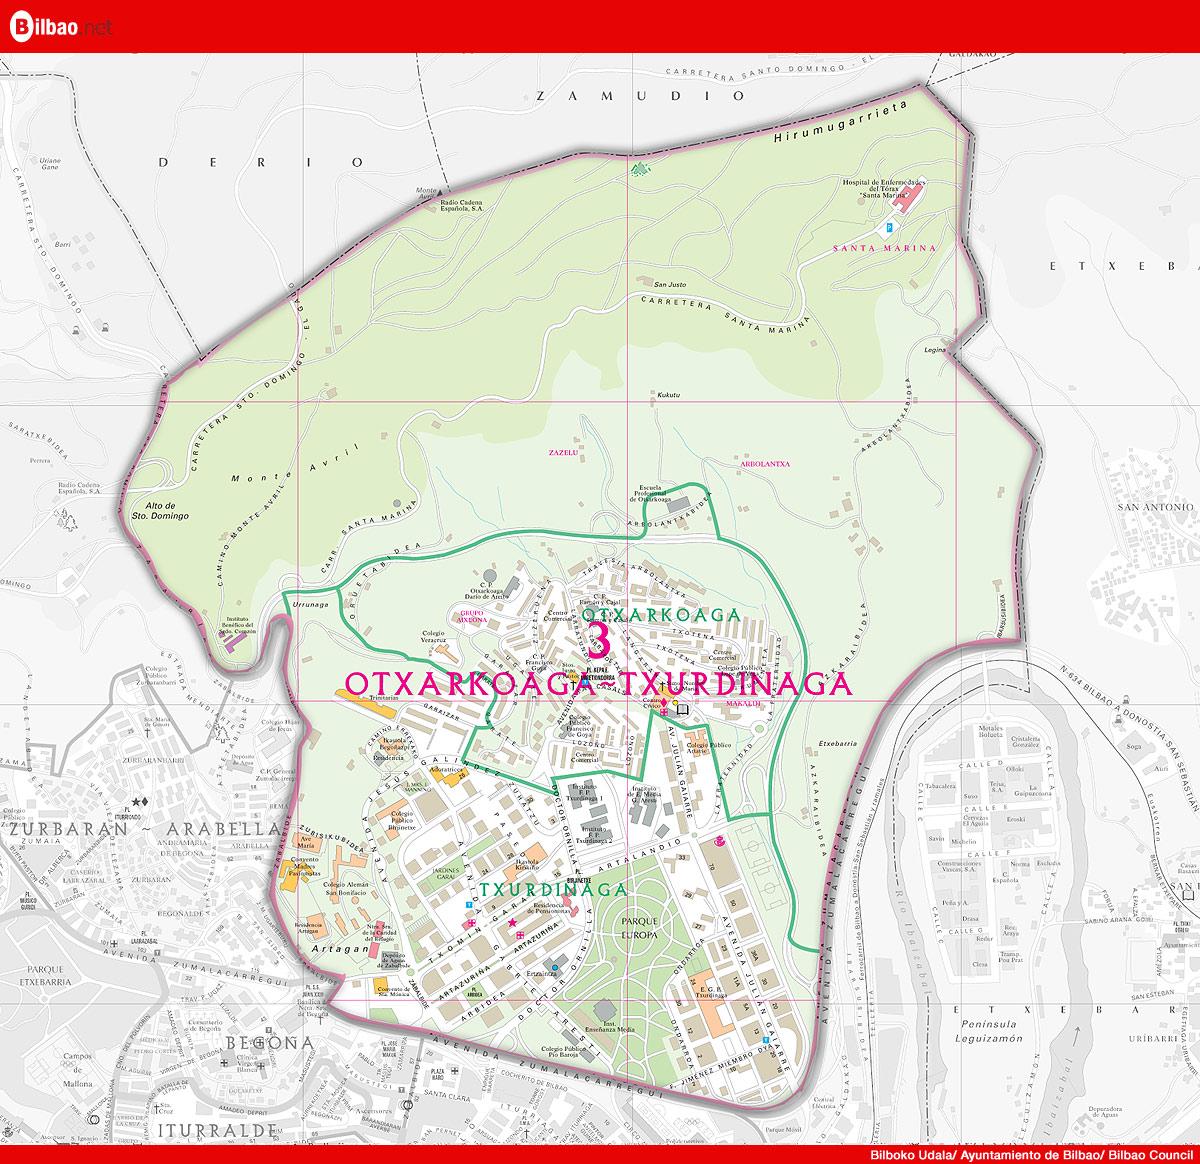 Distrito de Otxarkoaga-Txurdinaga